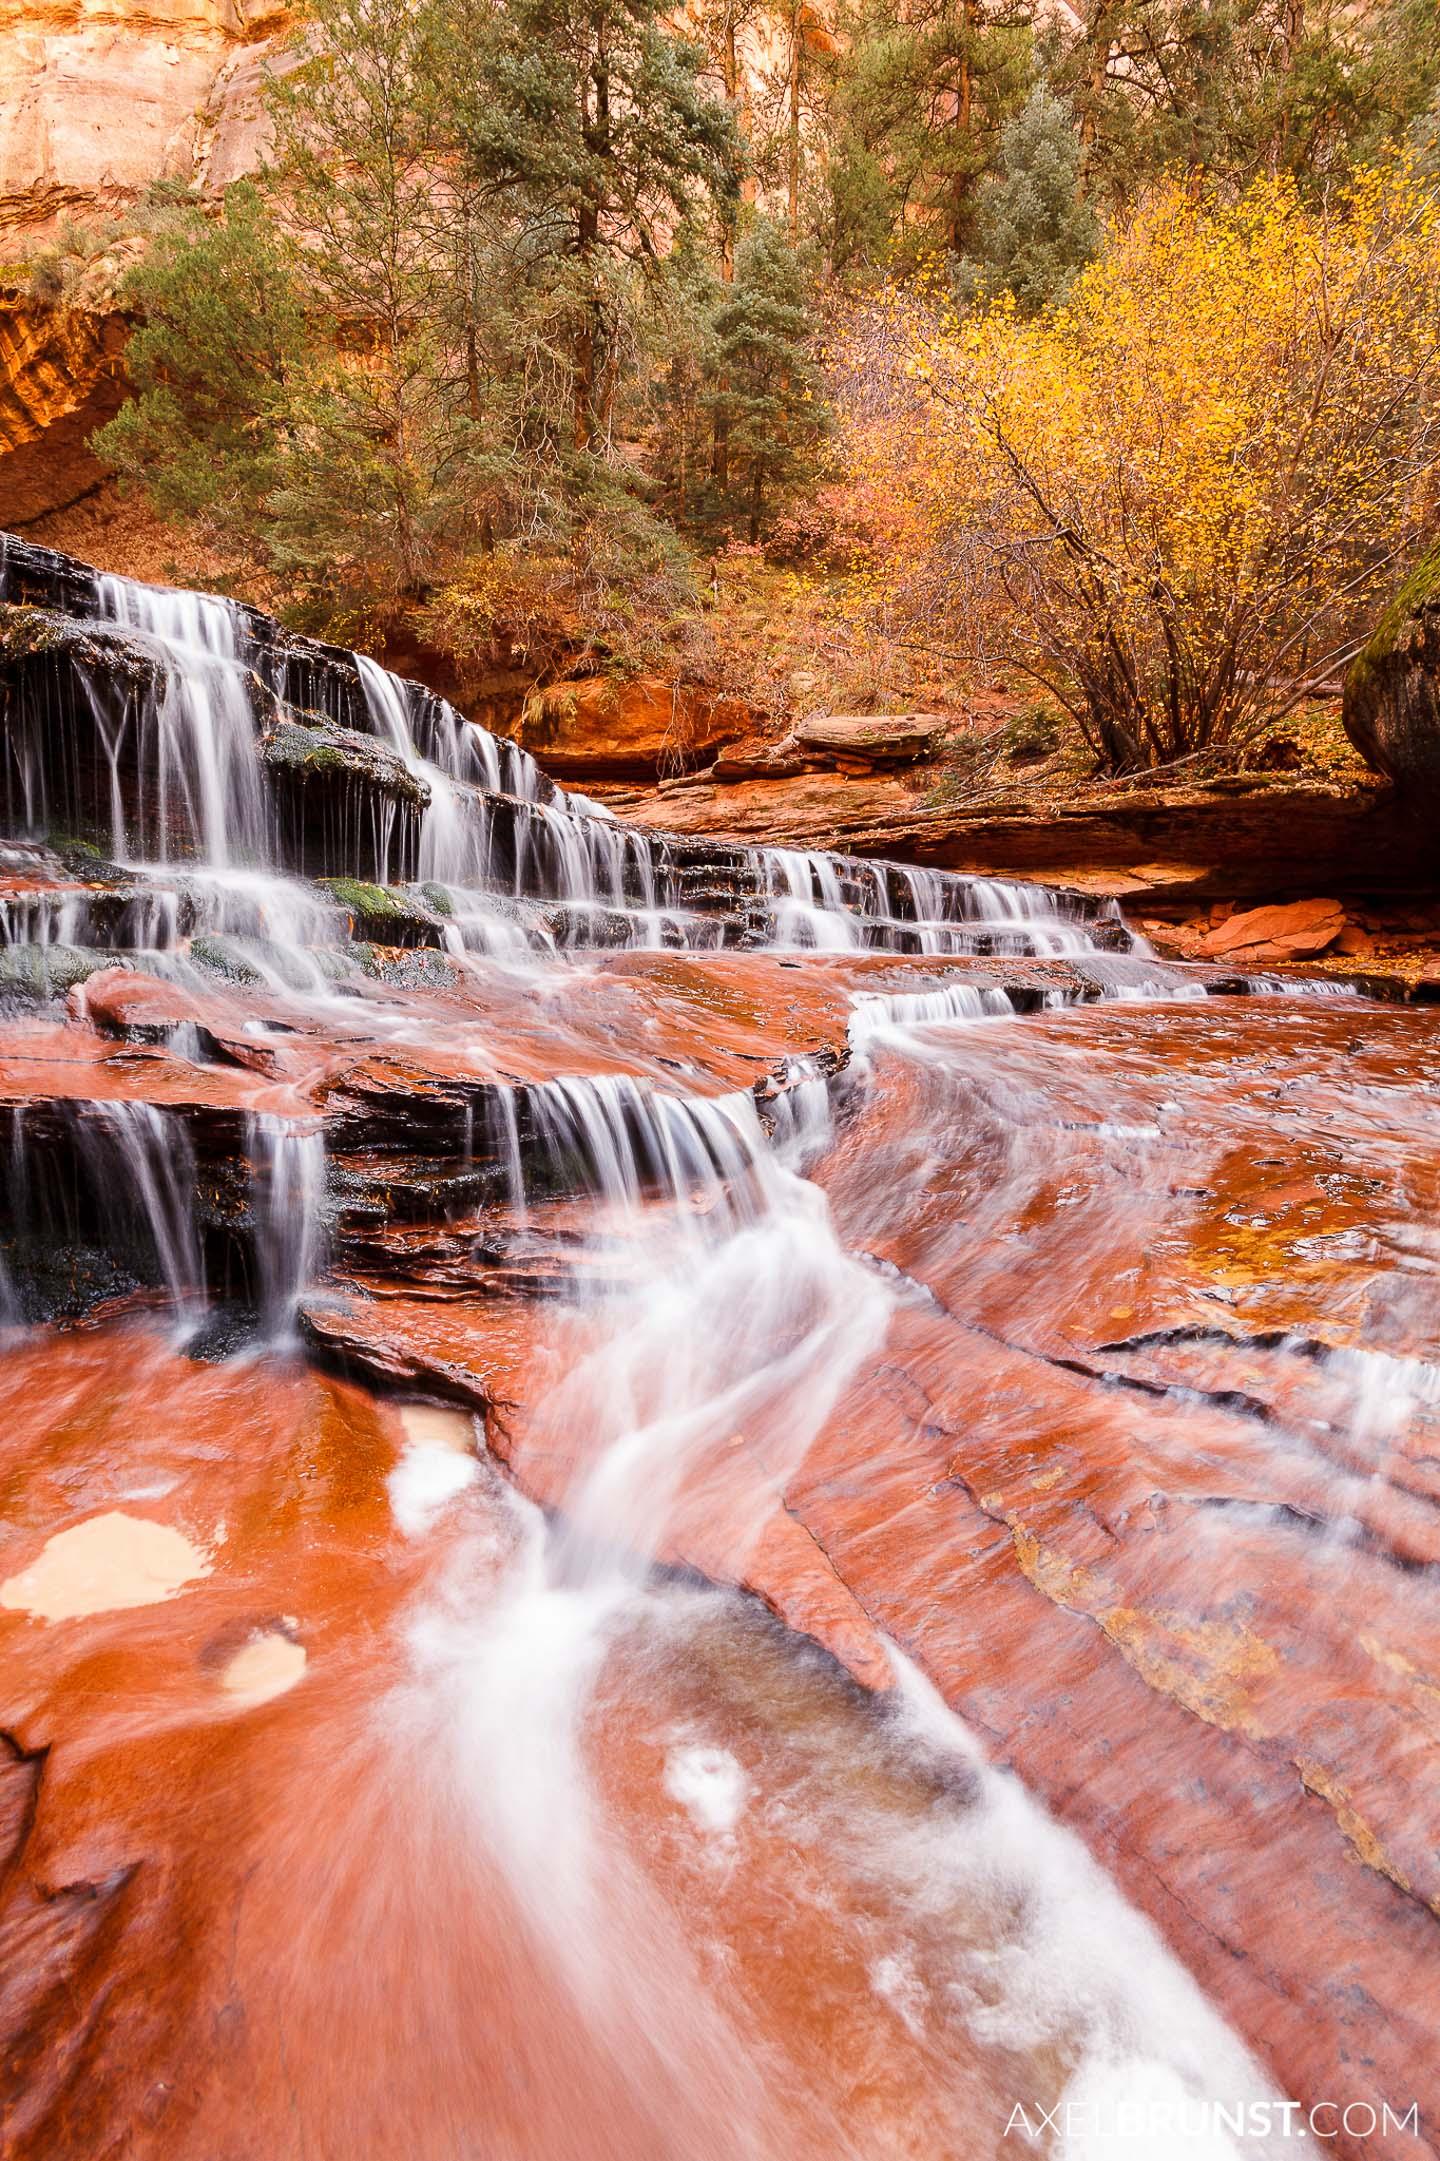 Zion-national-park-utah-3.jpg